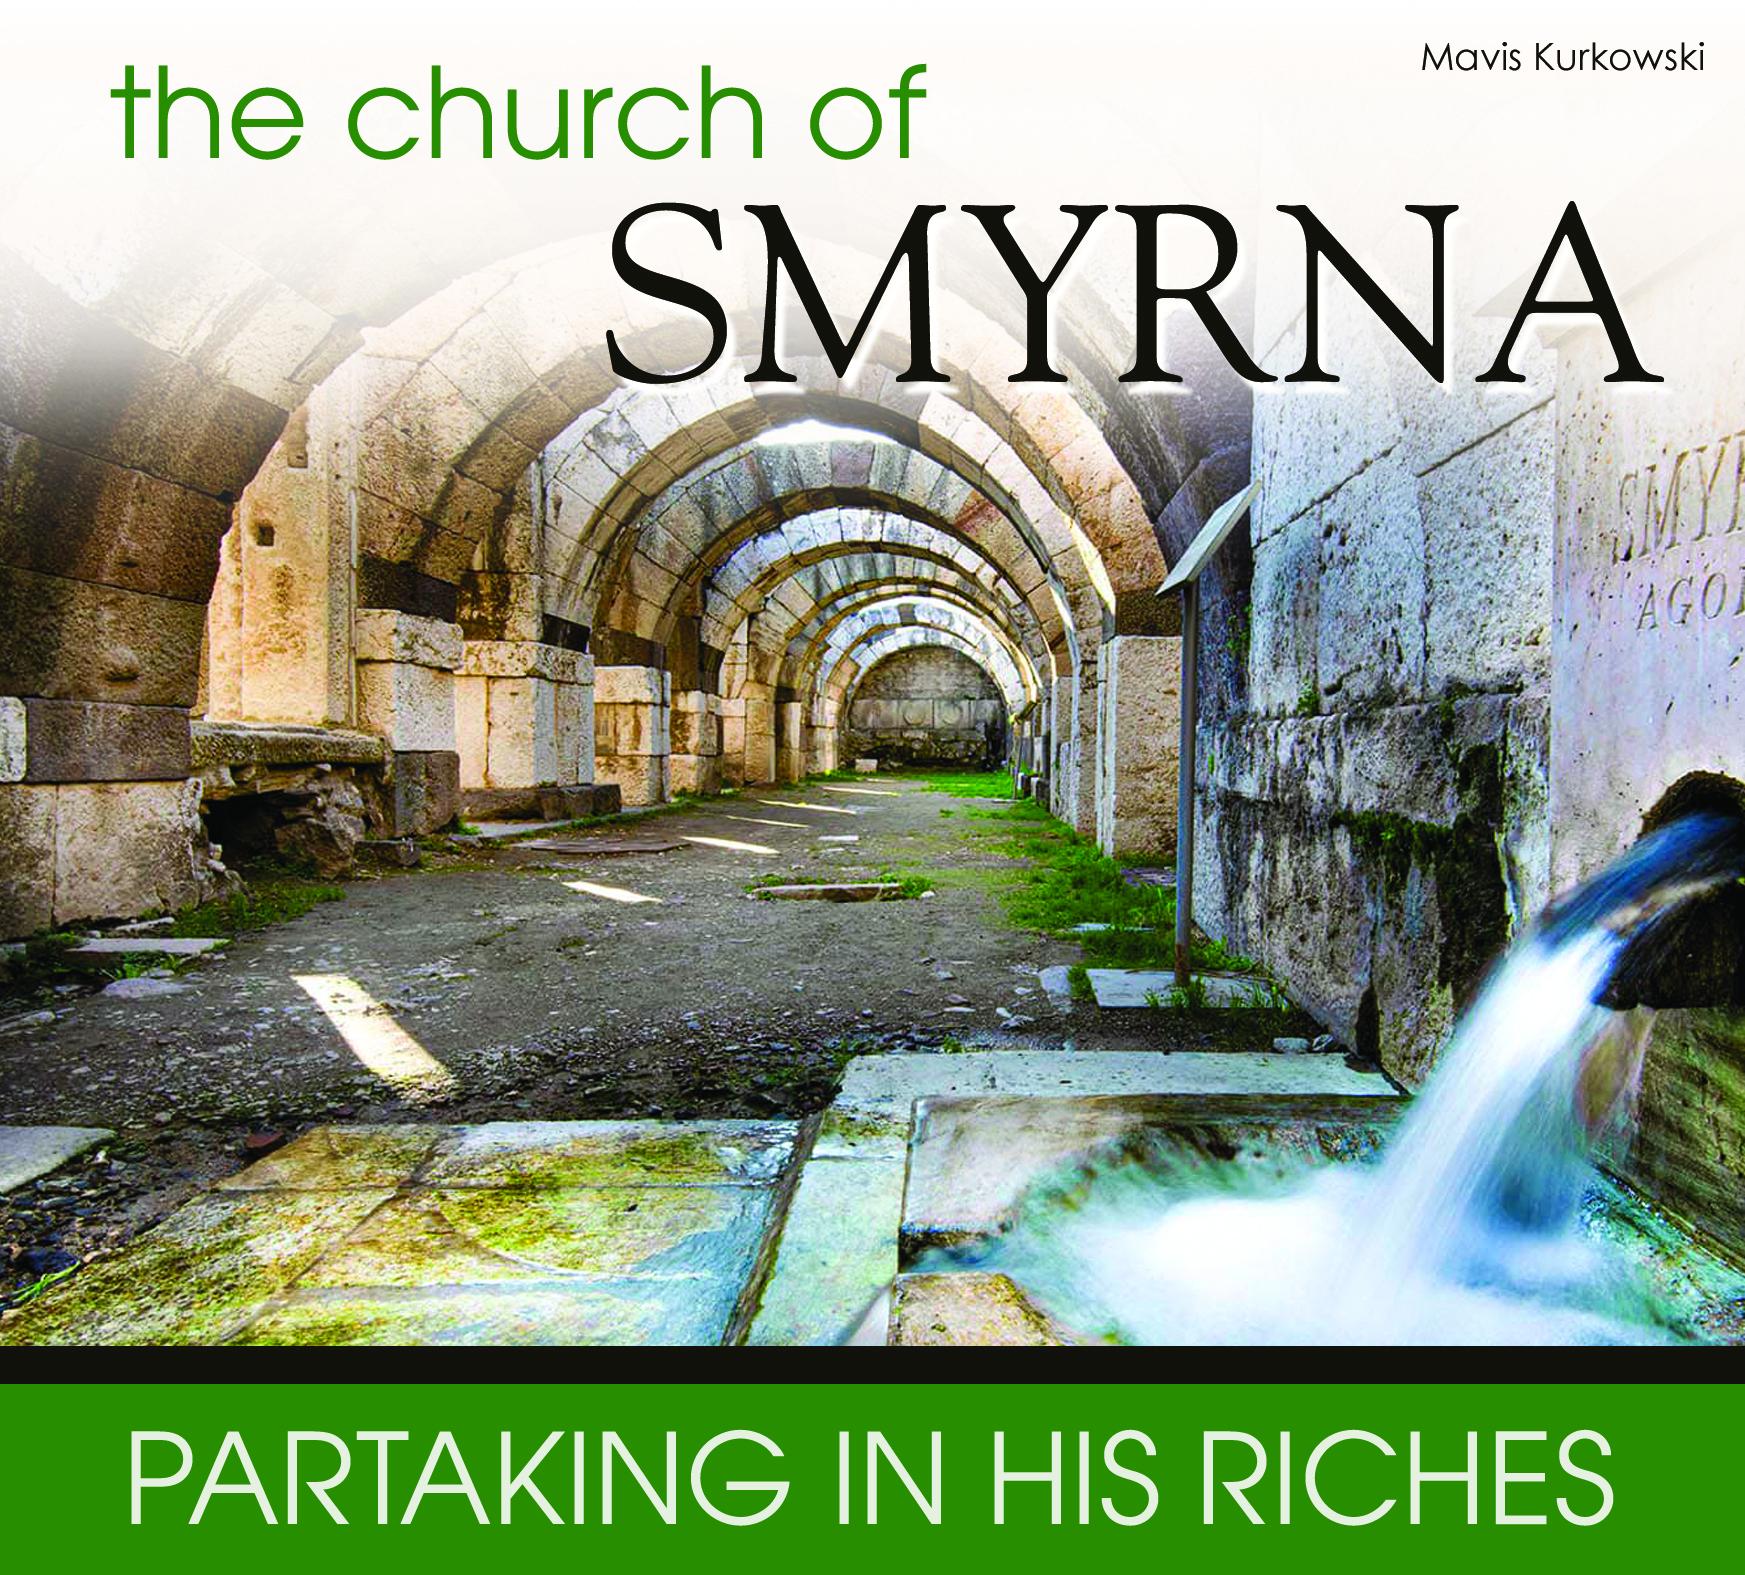 The Church of Smyrna